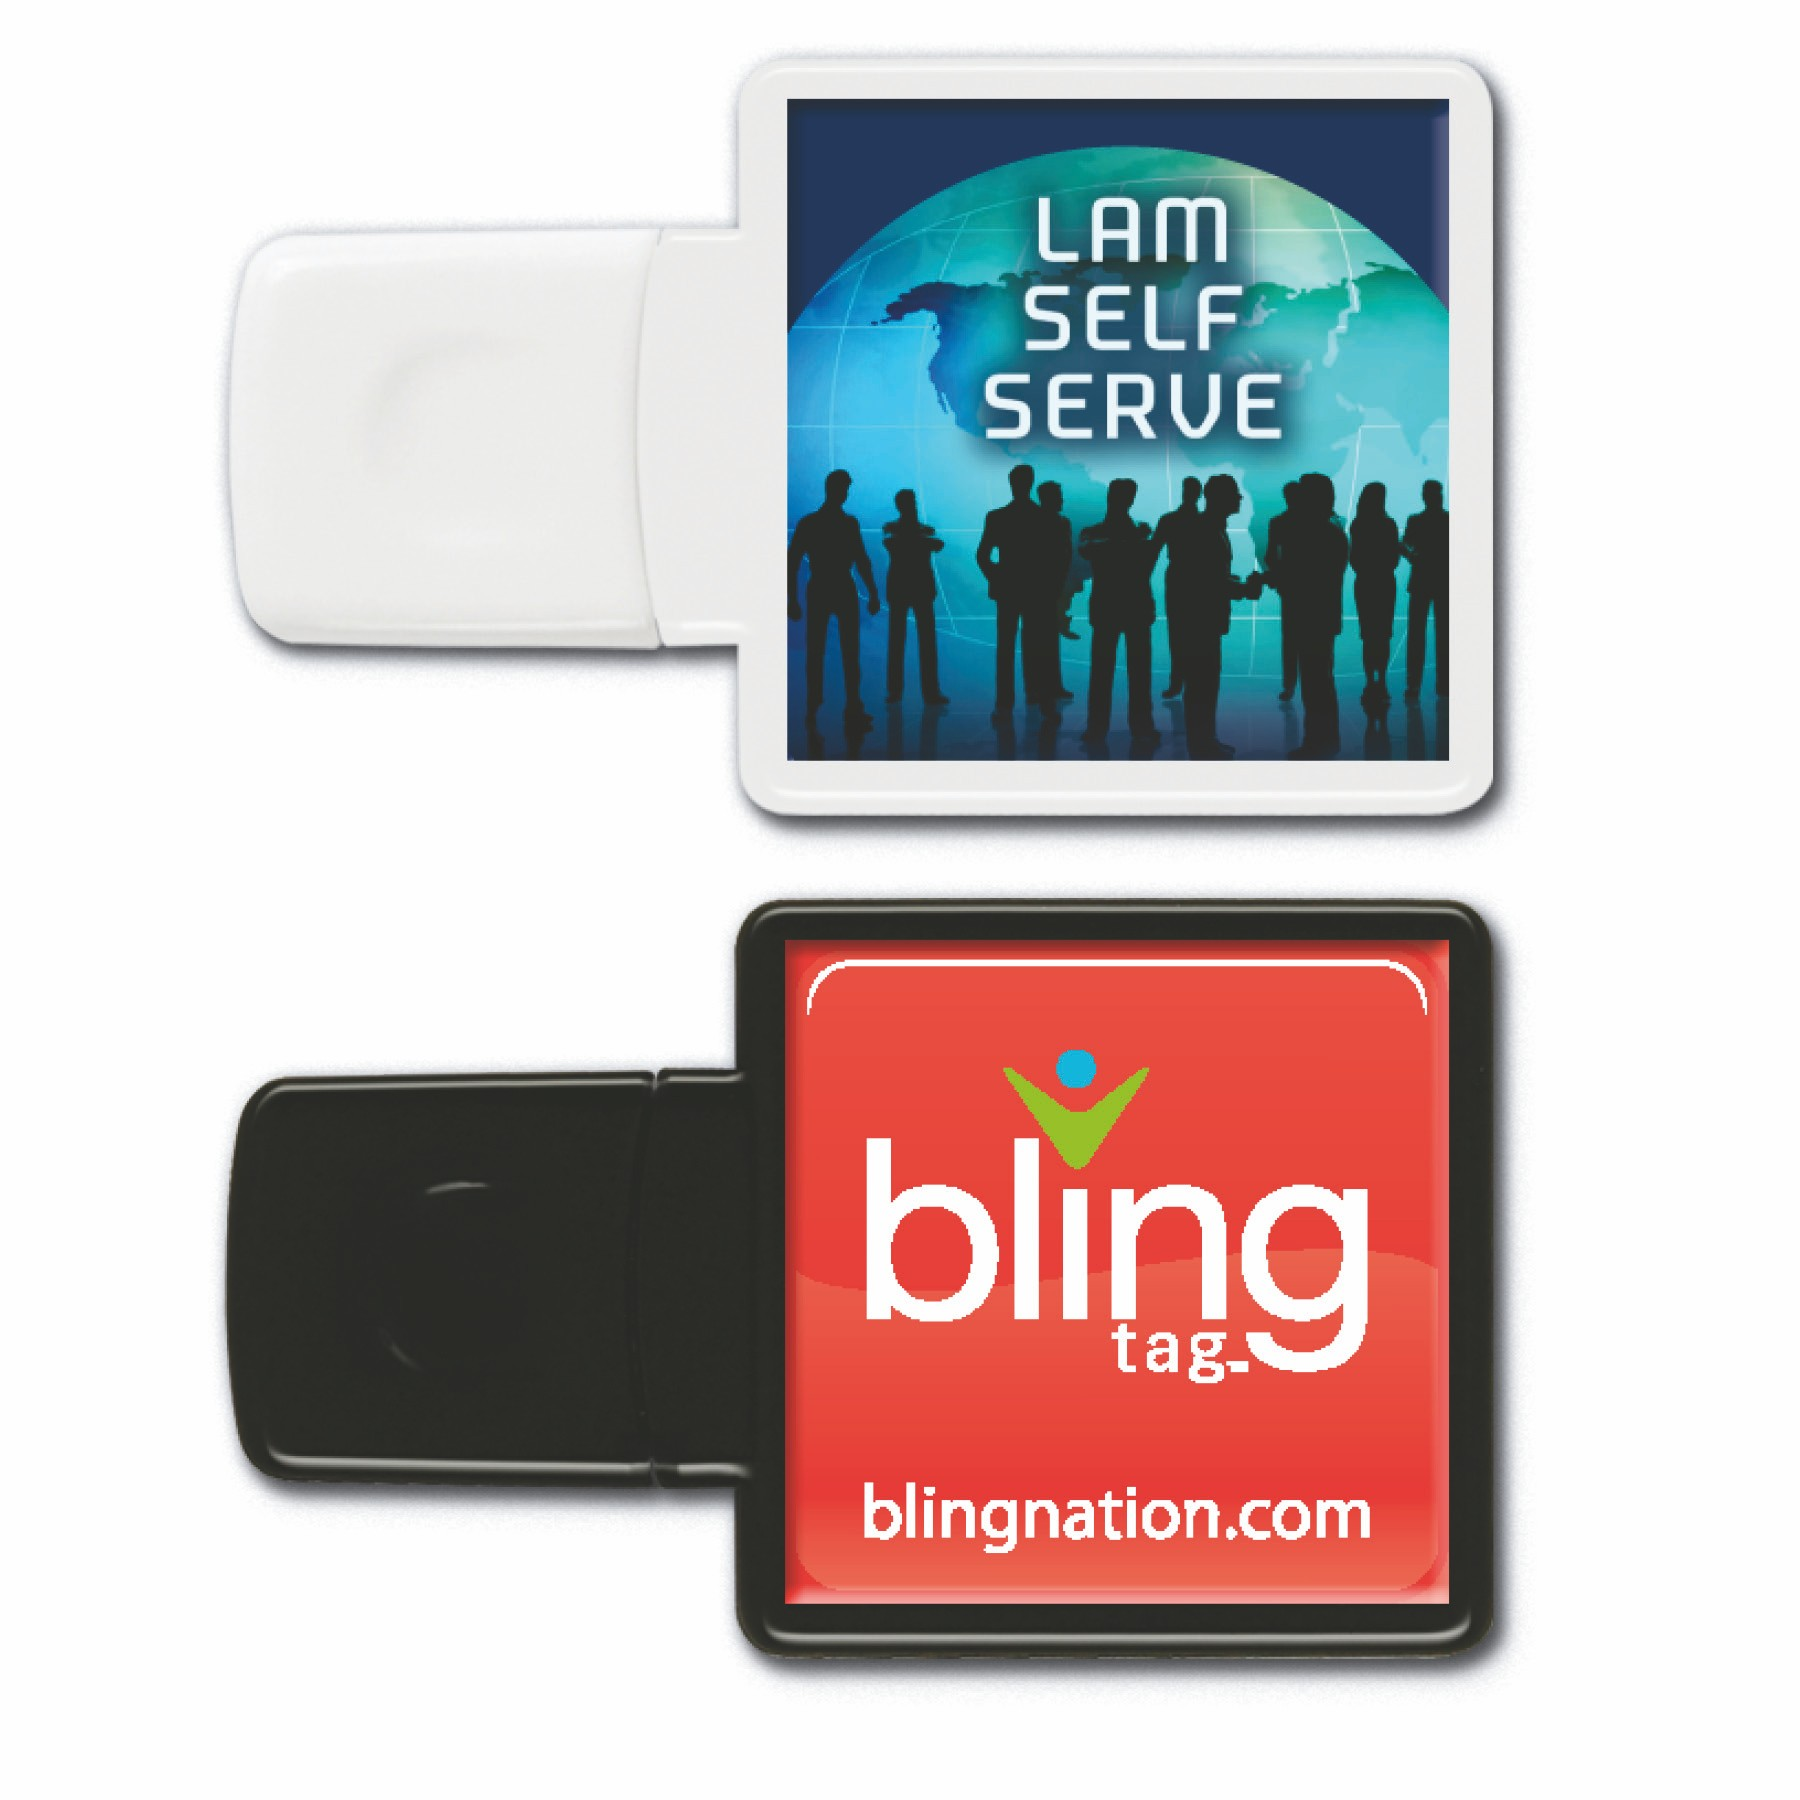 KRAIO-USBVS-16GB